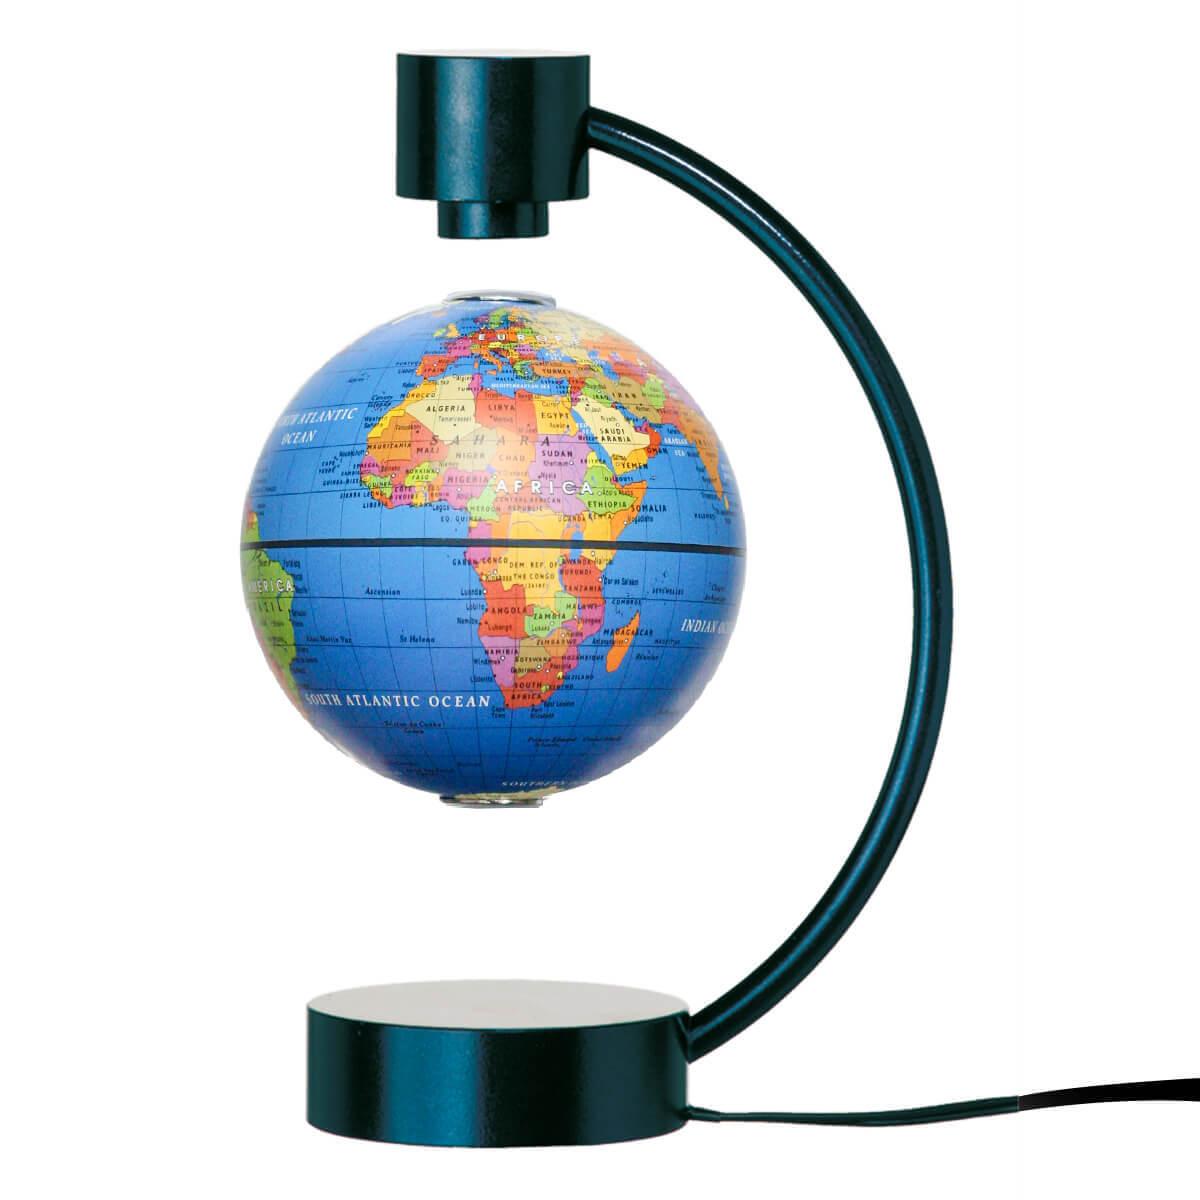 STIEFEL Magnetický glóbus modrý - klasický s anglickými názvami